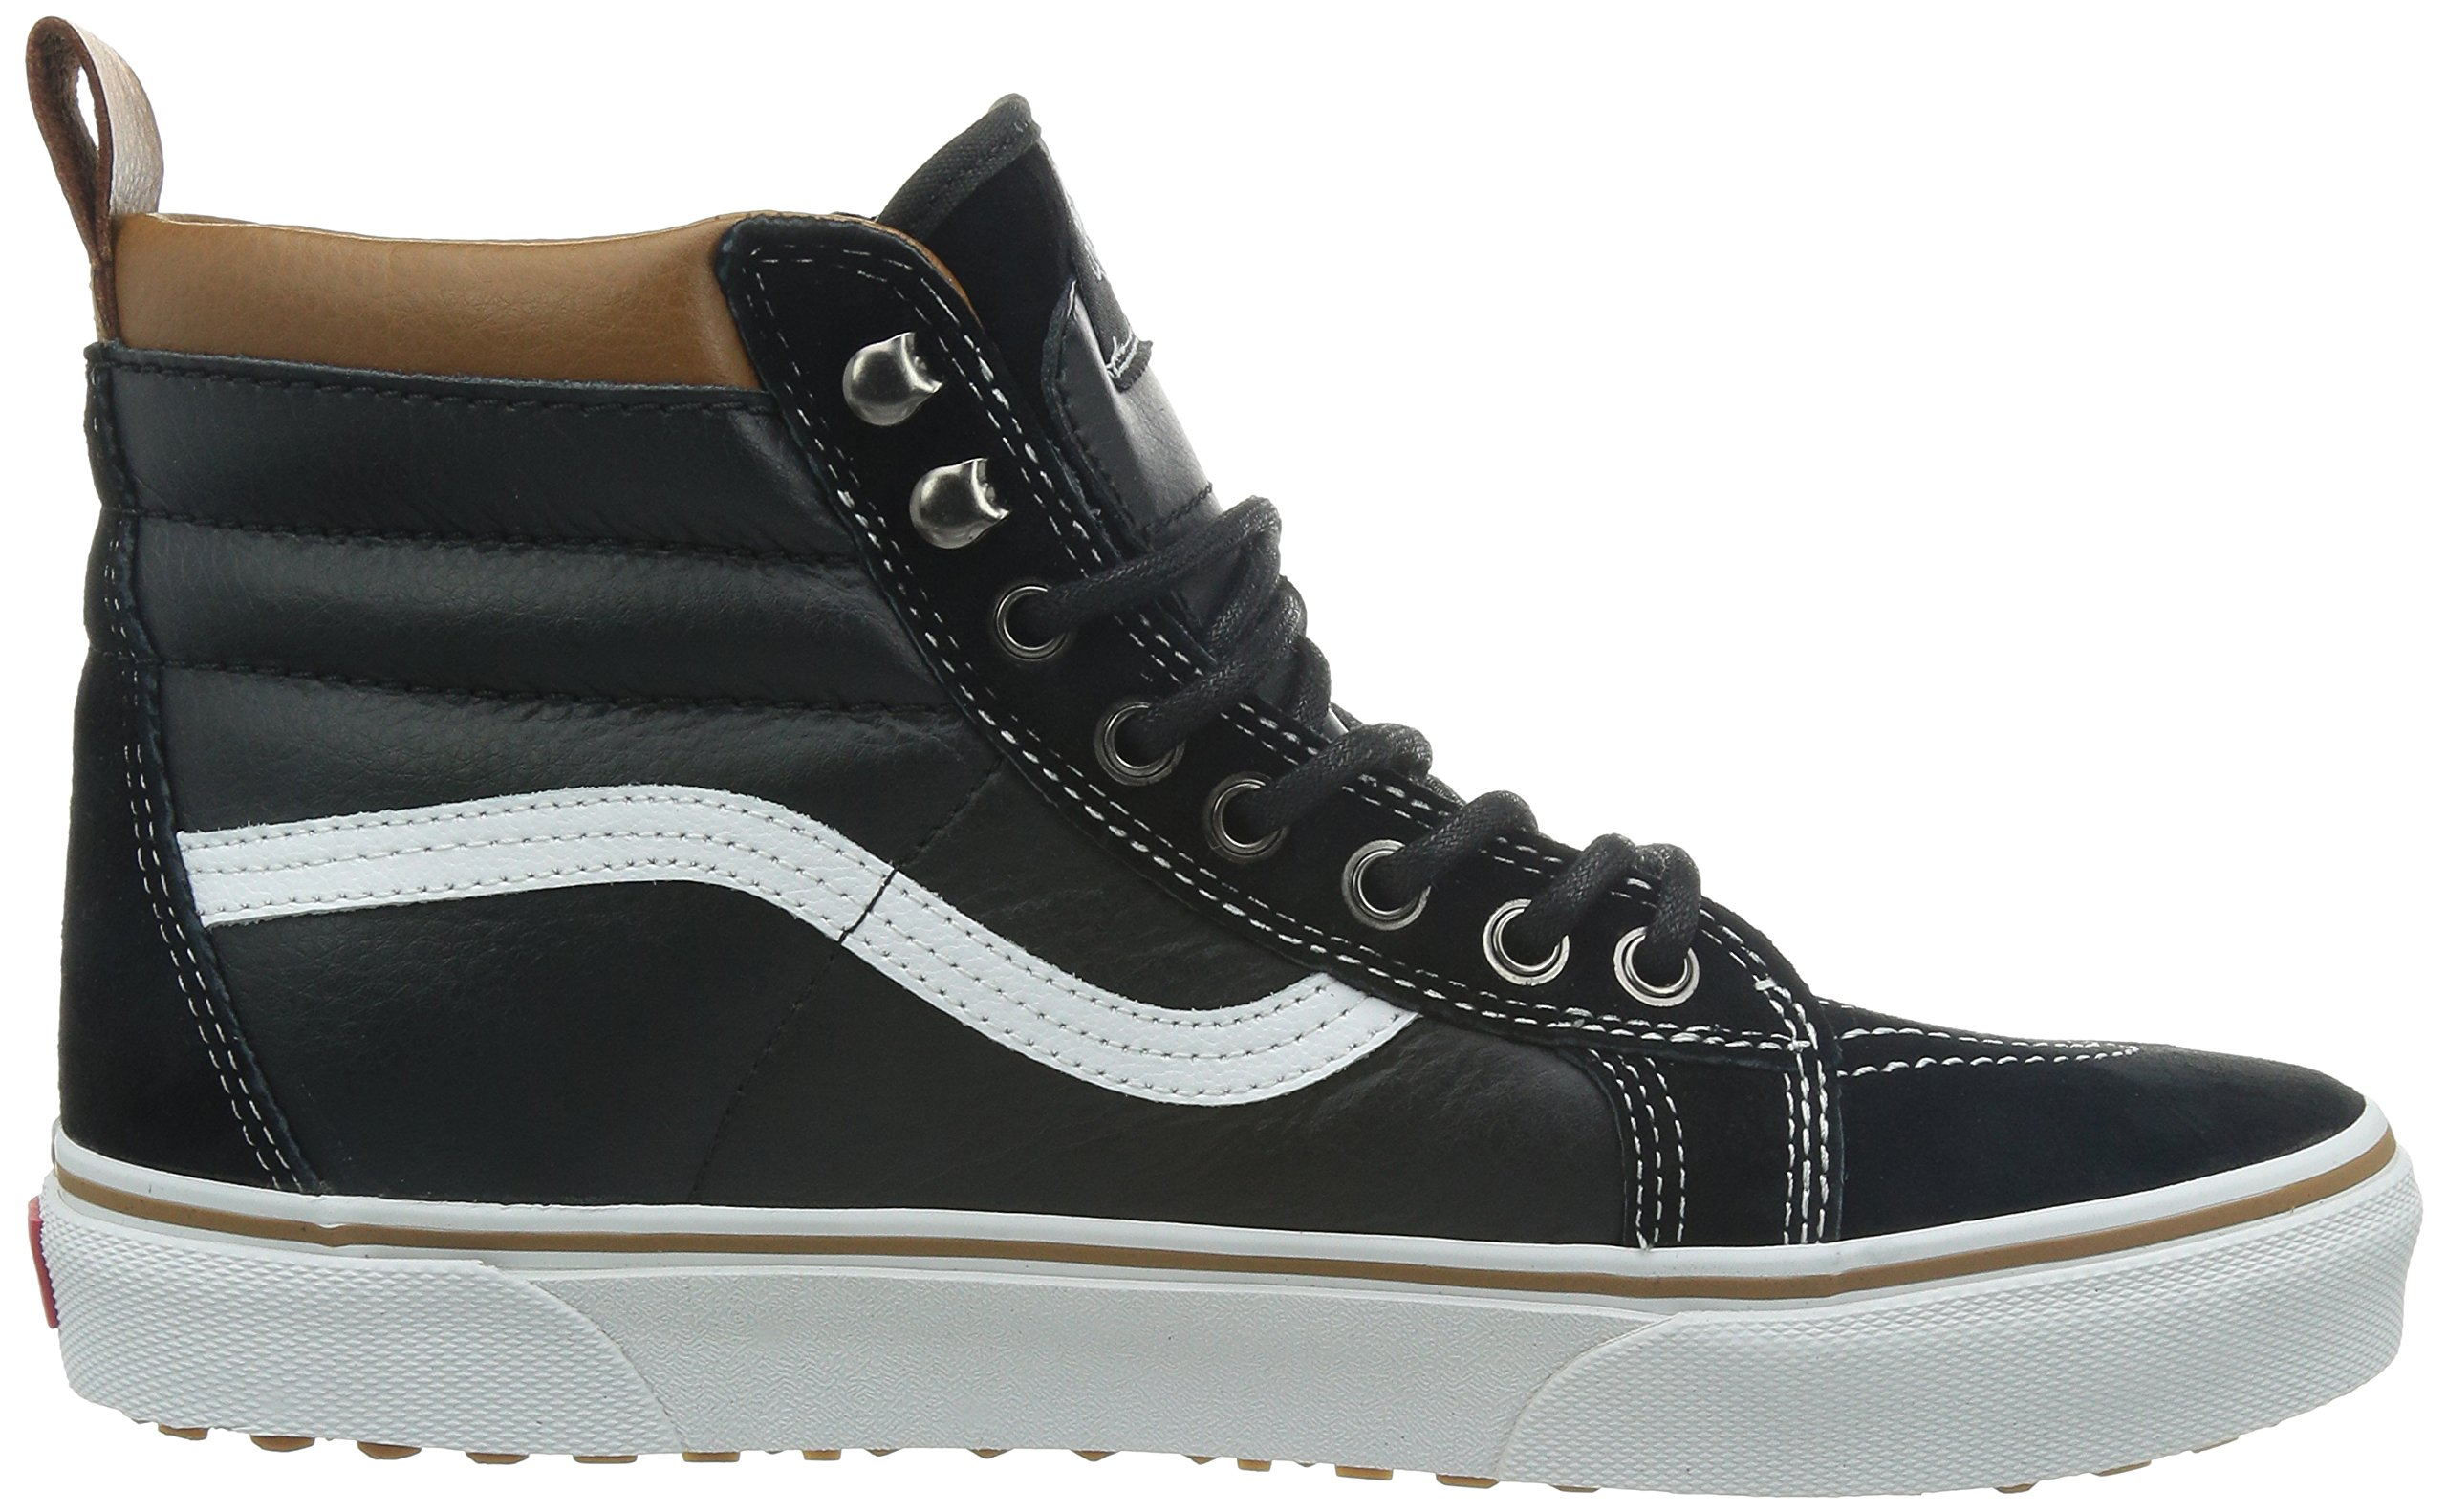 Vans Unisex Sk8-Hi MTE (MTE) Black/True White Skate Shoe 8.5 Men US/10 Women US by Vans (Image #7)